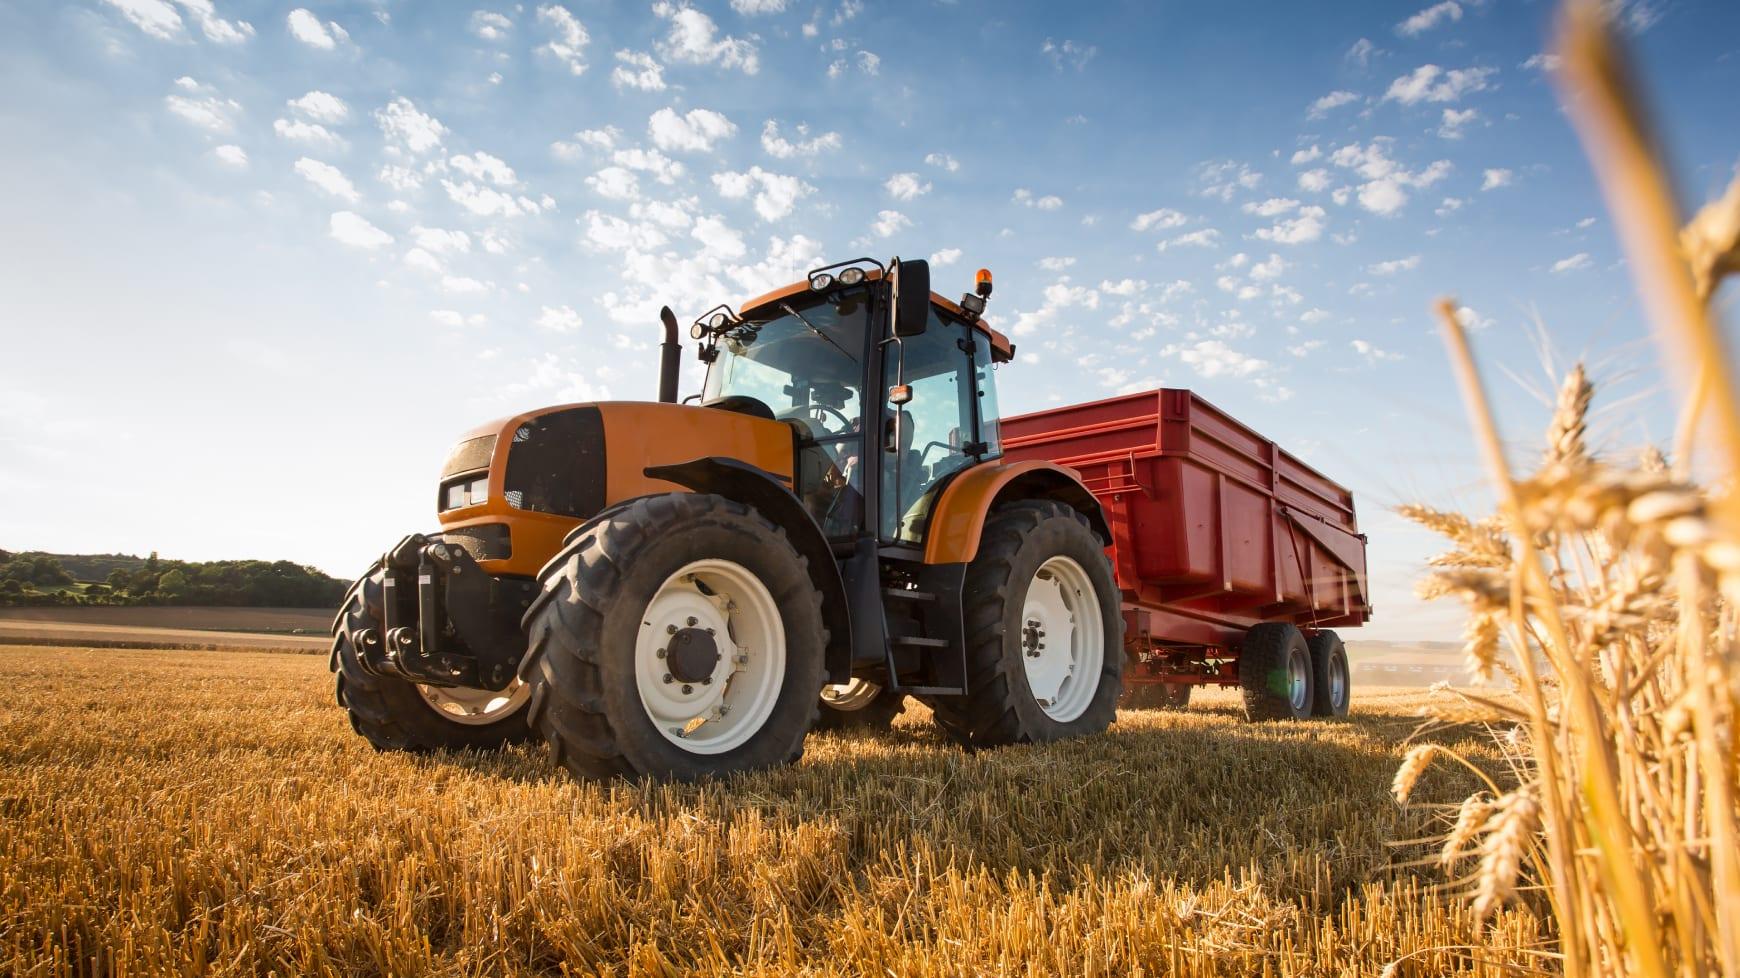 Farming Tractor Driving Through Crops